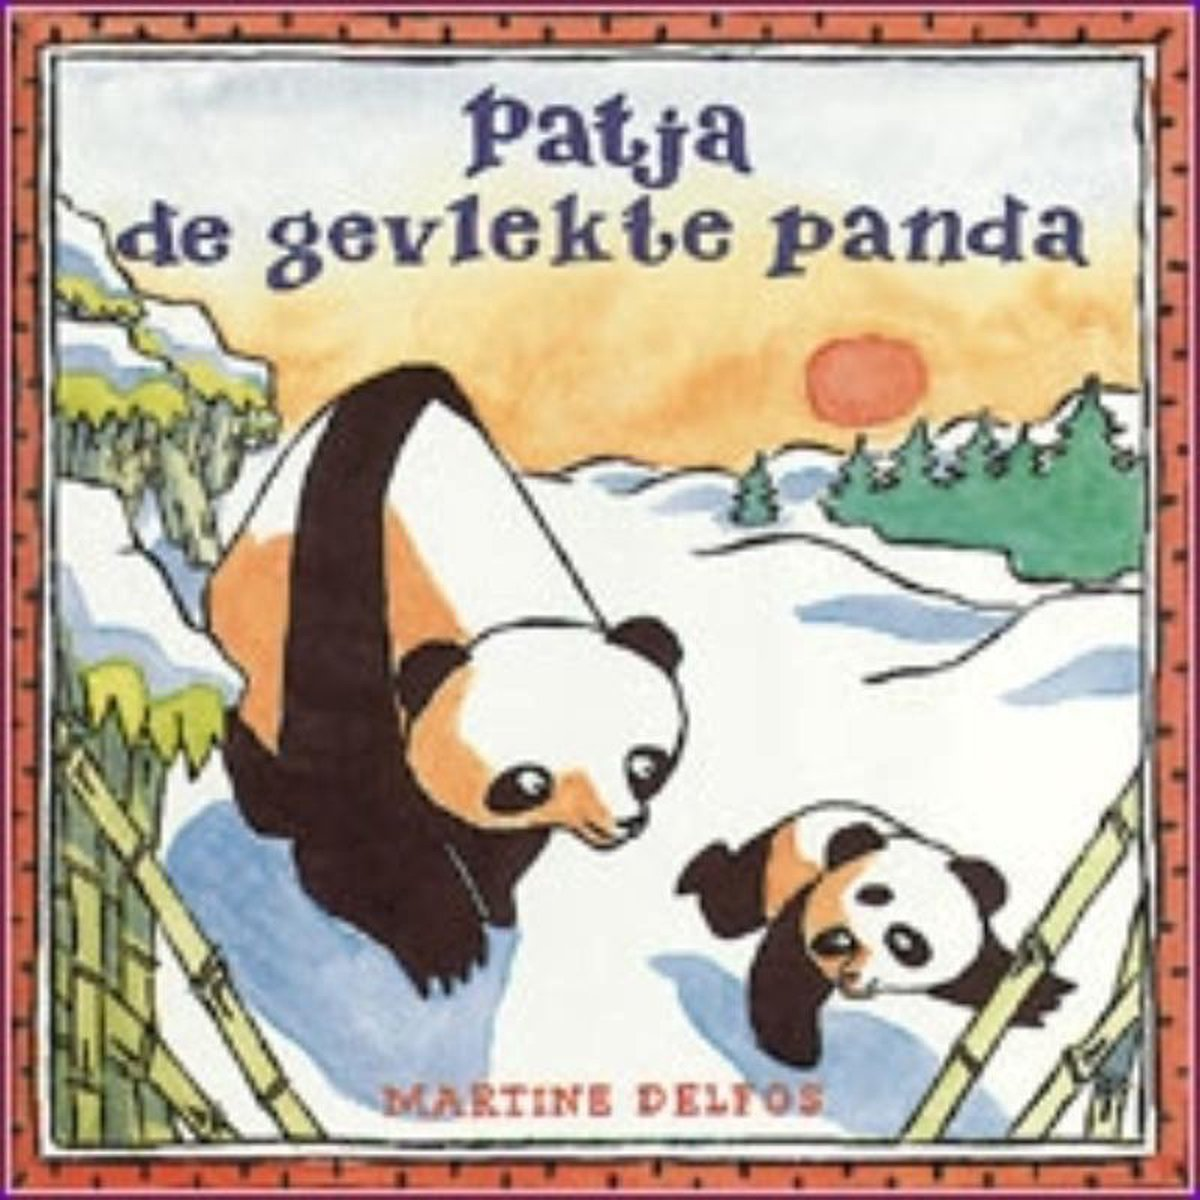 Patja de gevlekte panda - Martine Delfos